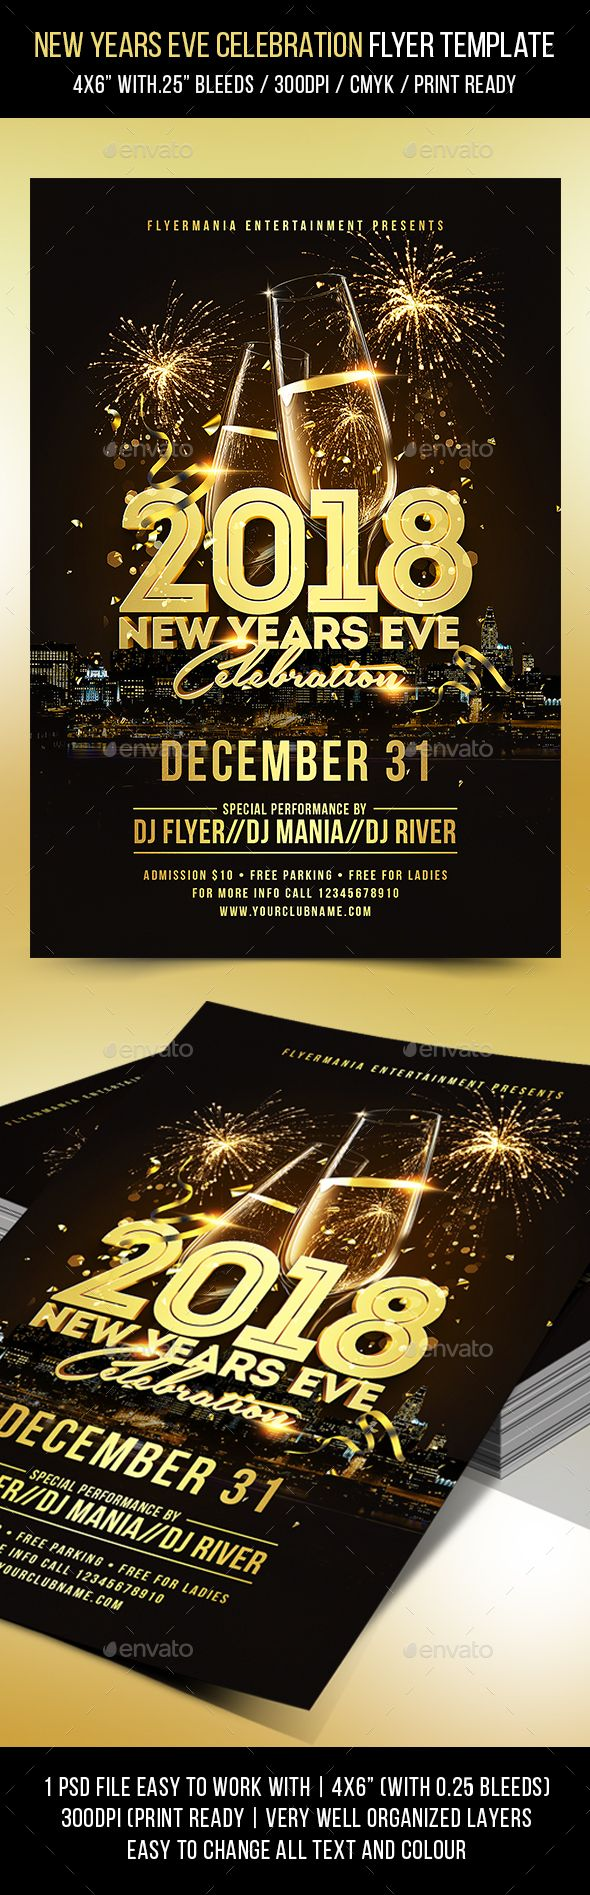 New Years Eve Celebration Flyer Template Pinterest Flyer